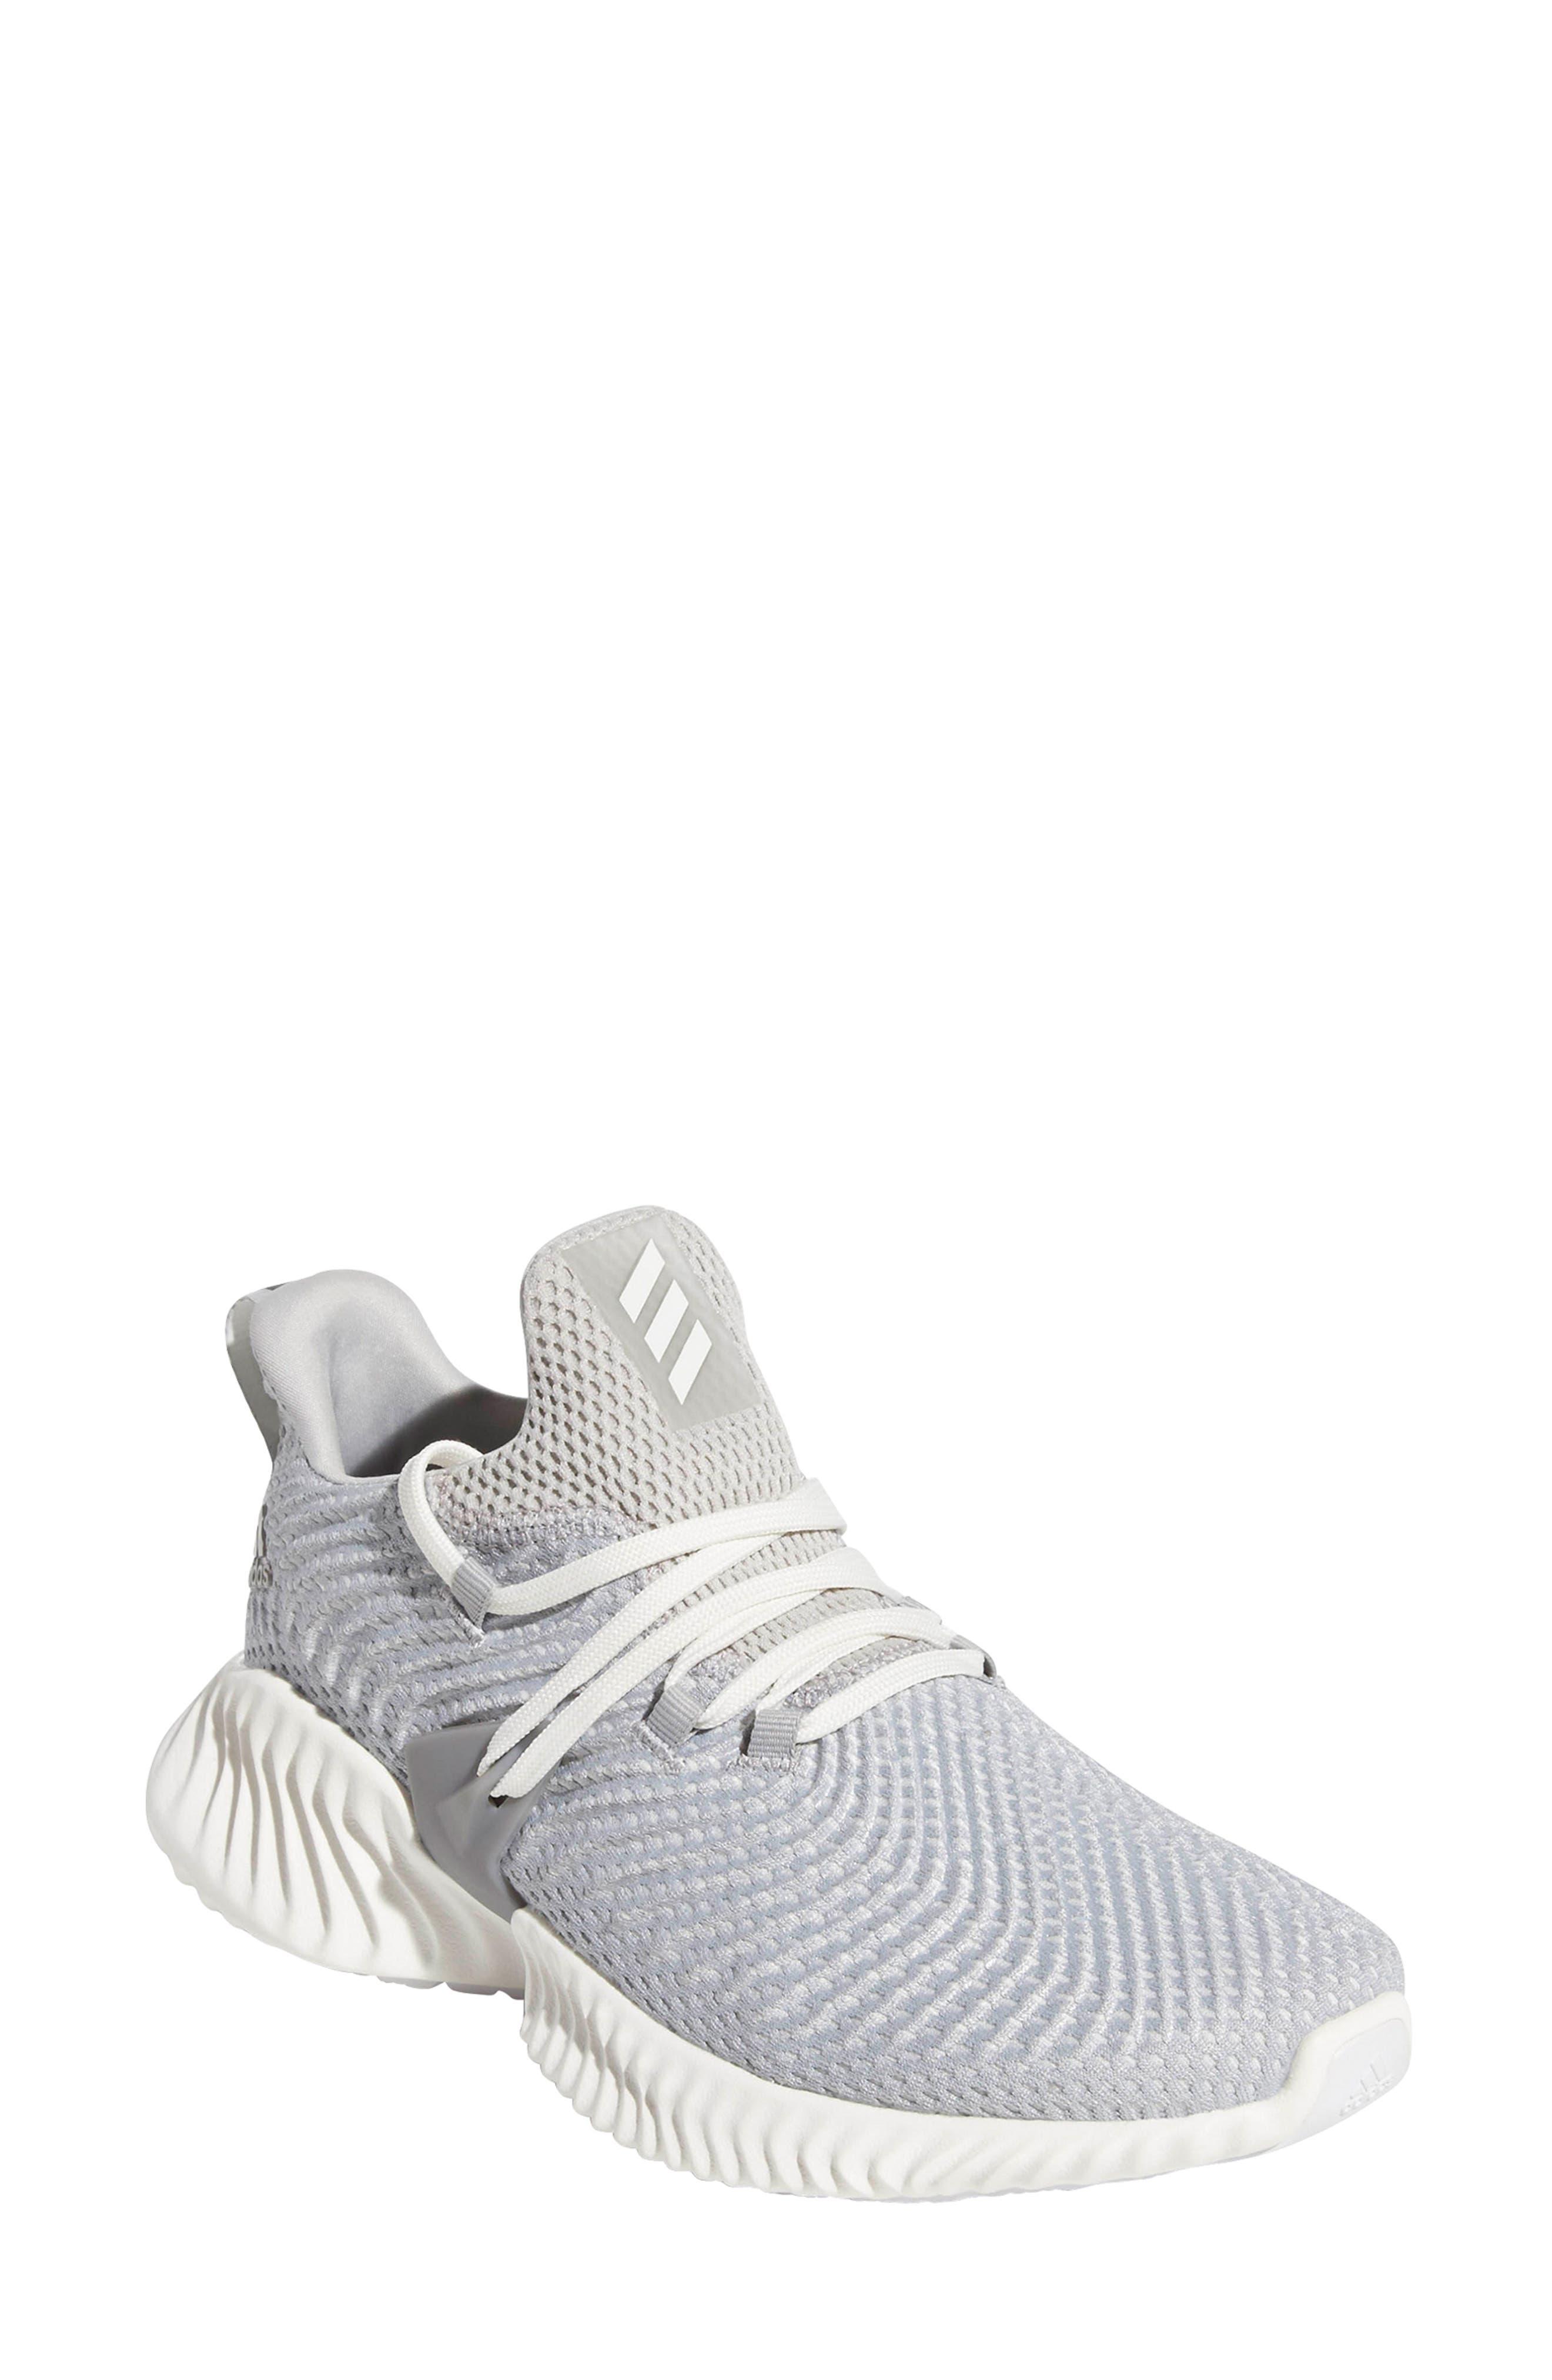 Adidas Alphabounce Instinct Sneaker, Grey